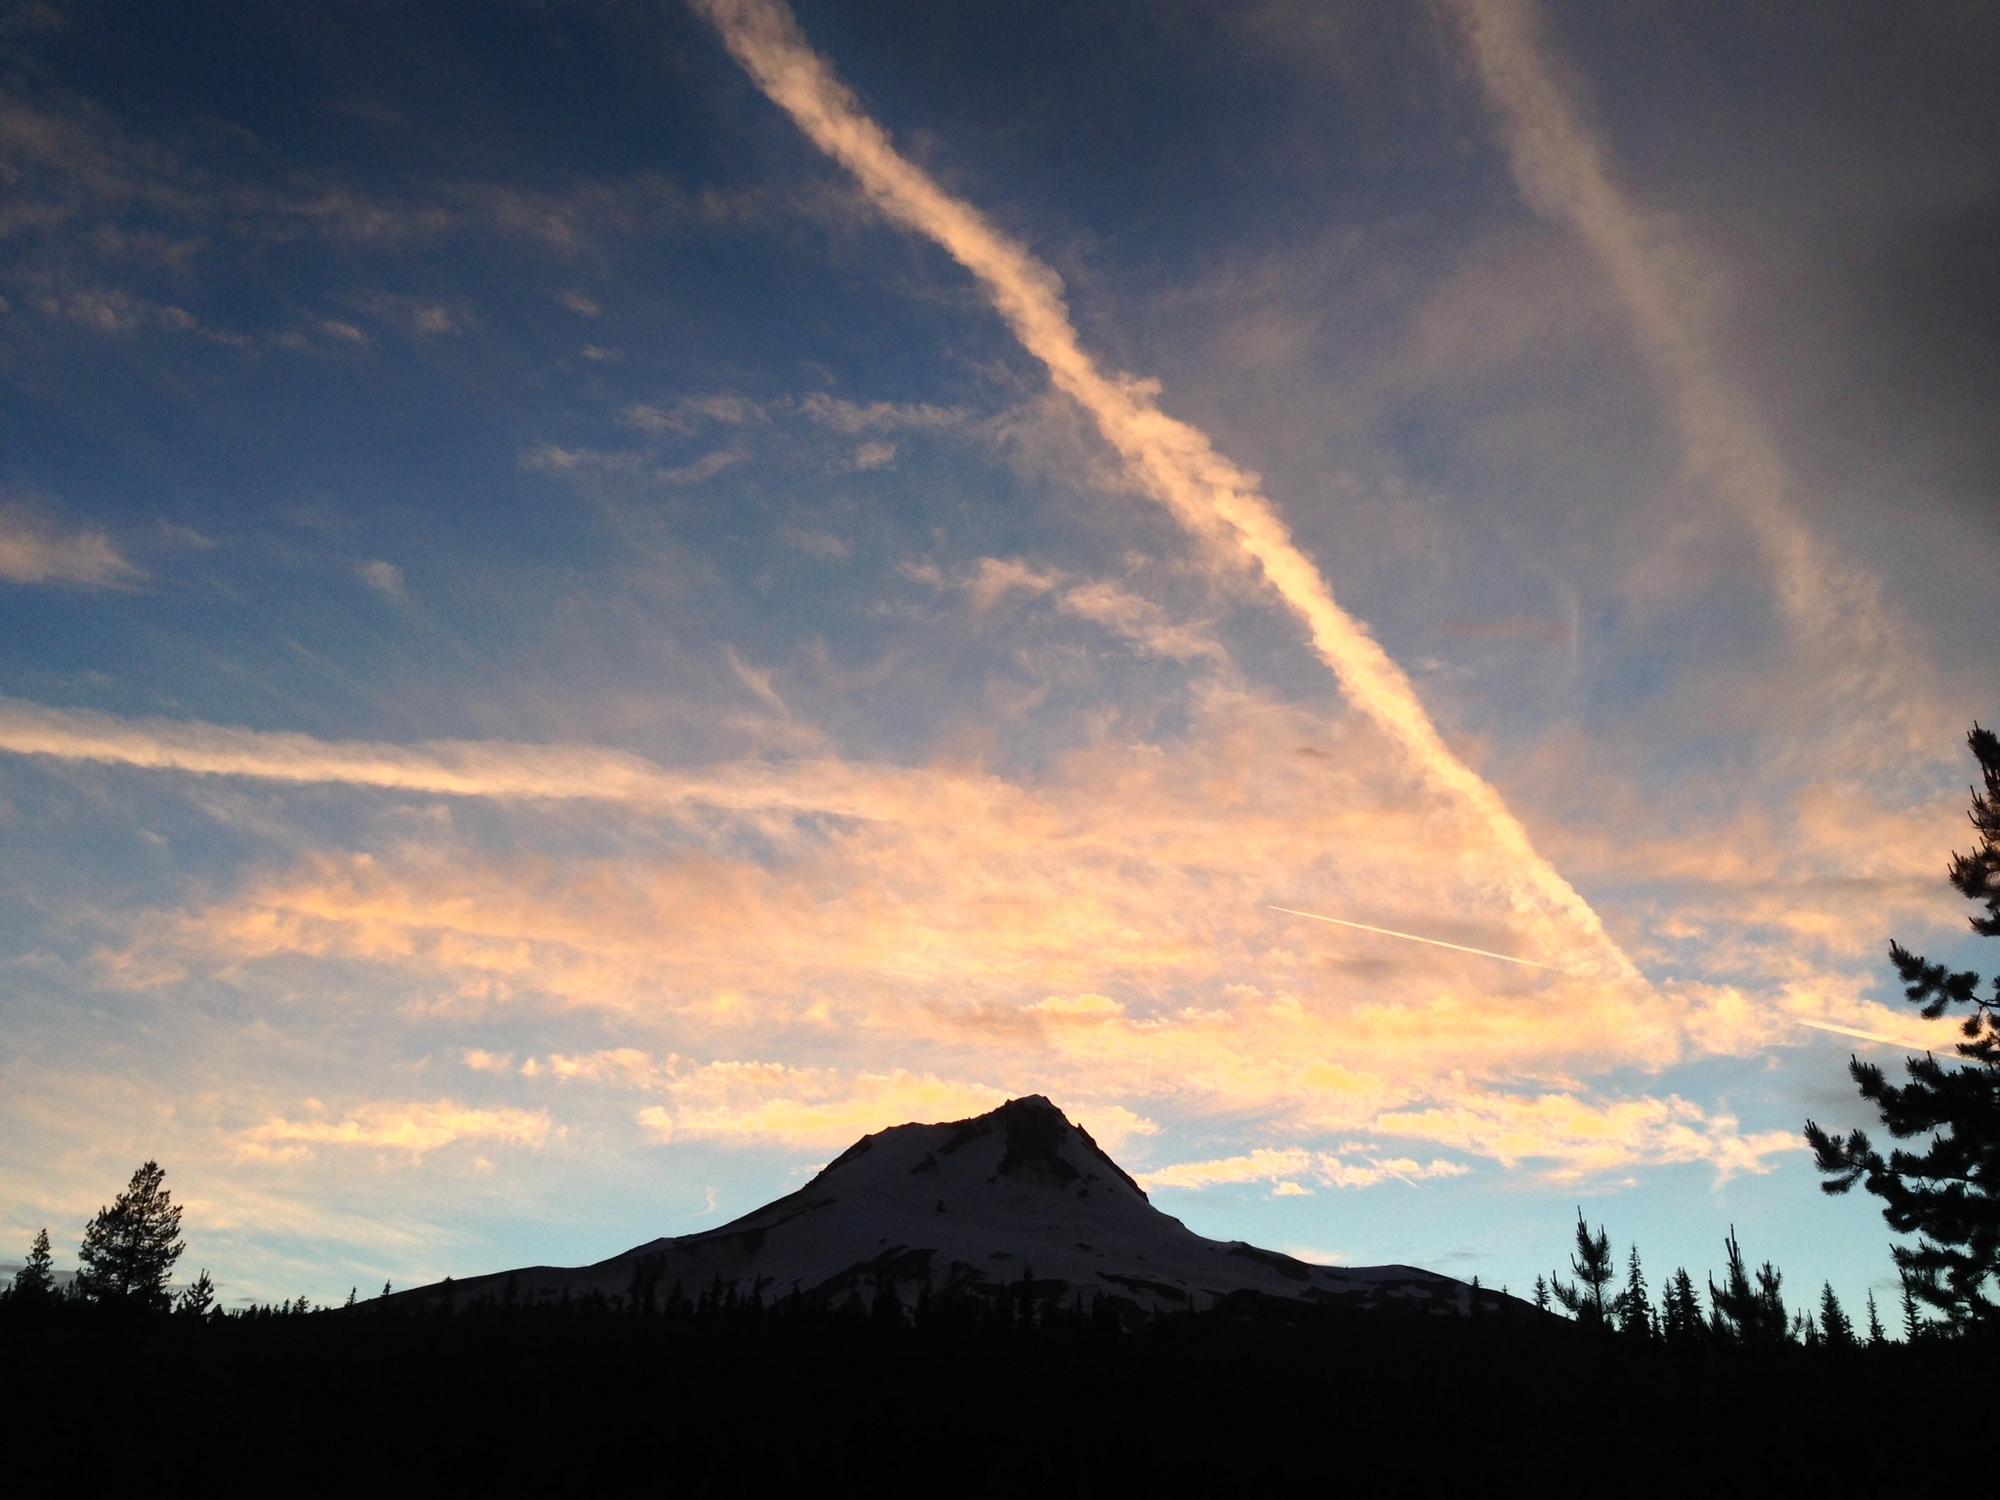 Backpacking through Elk Meadows, Oregon